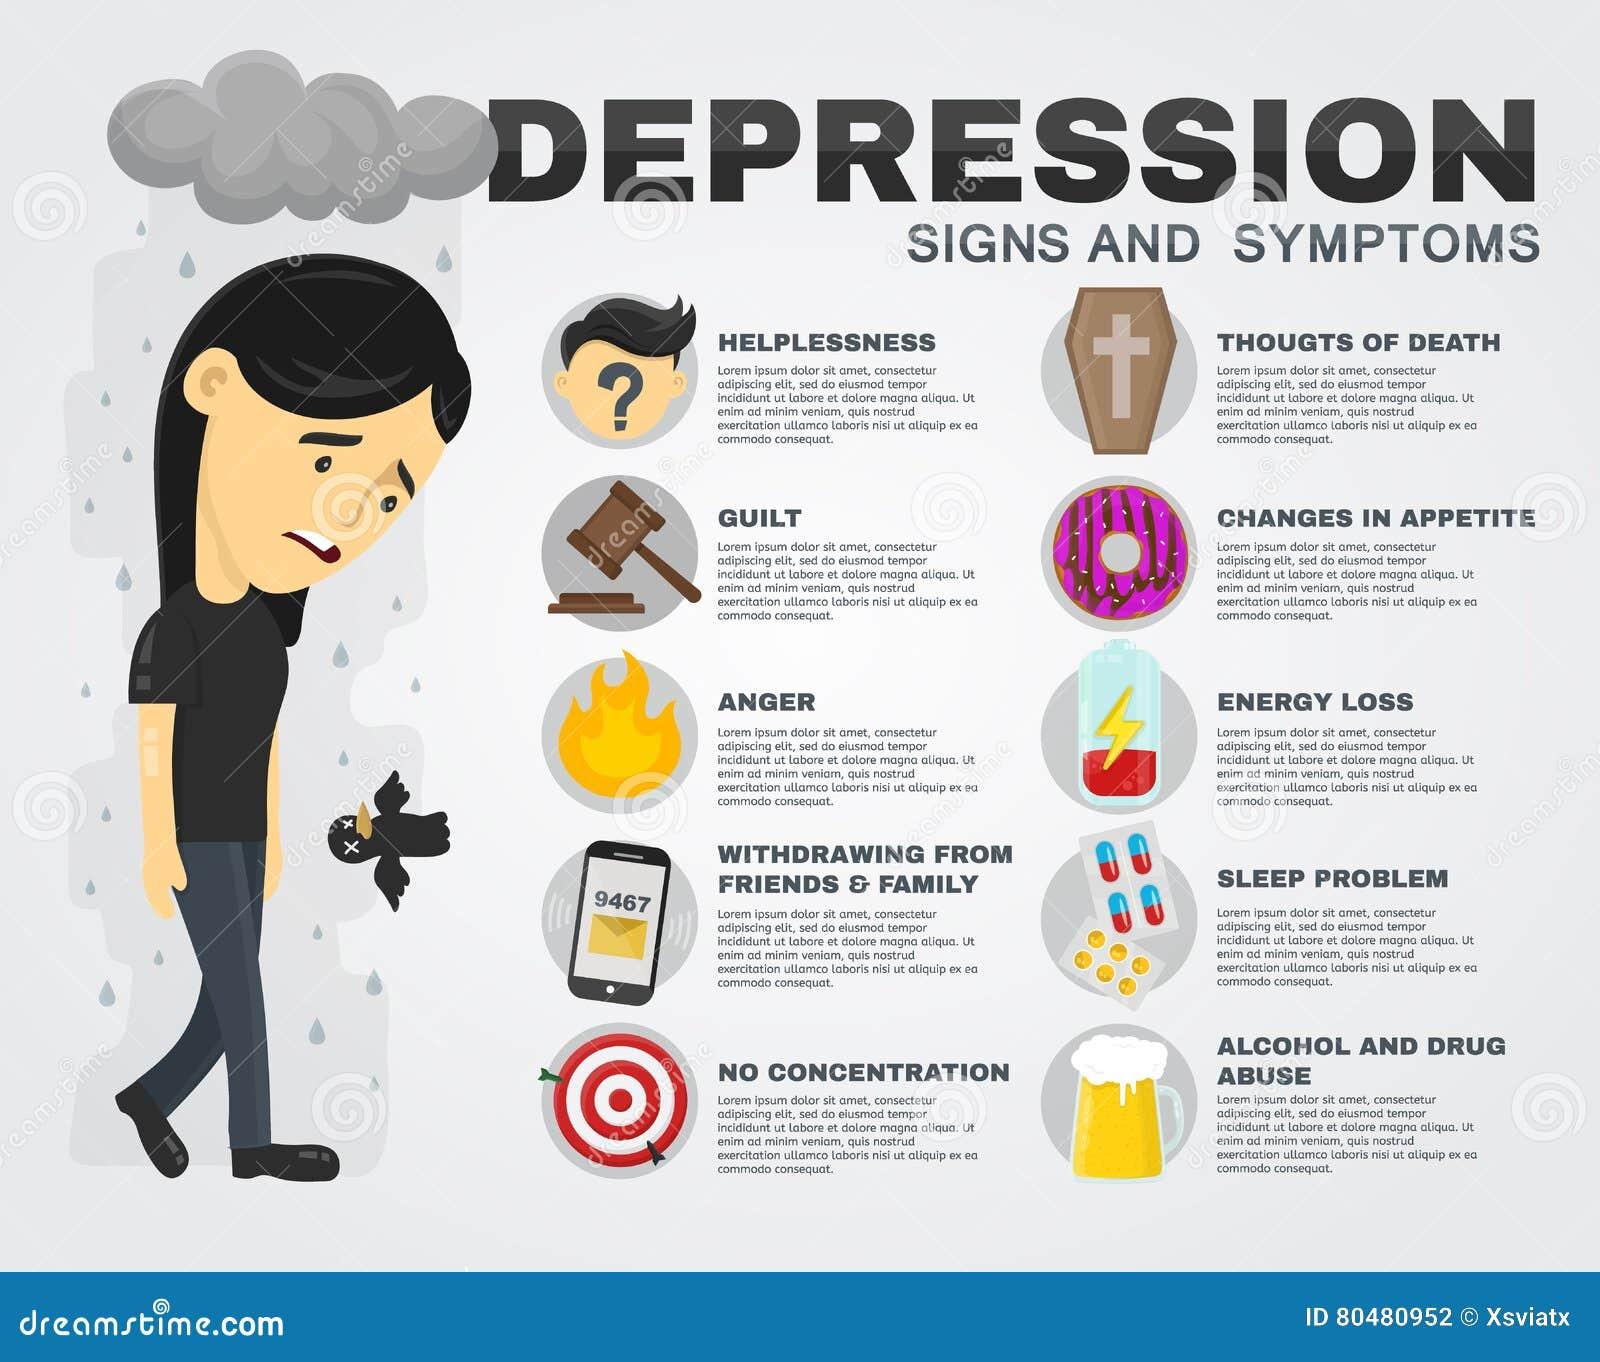 Depression Chatrooms